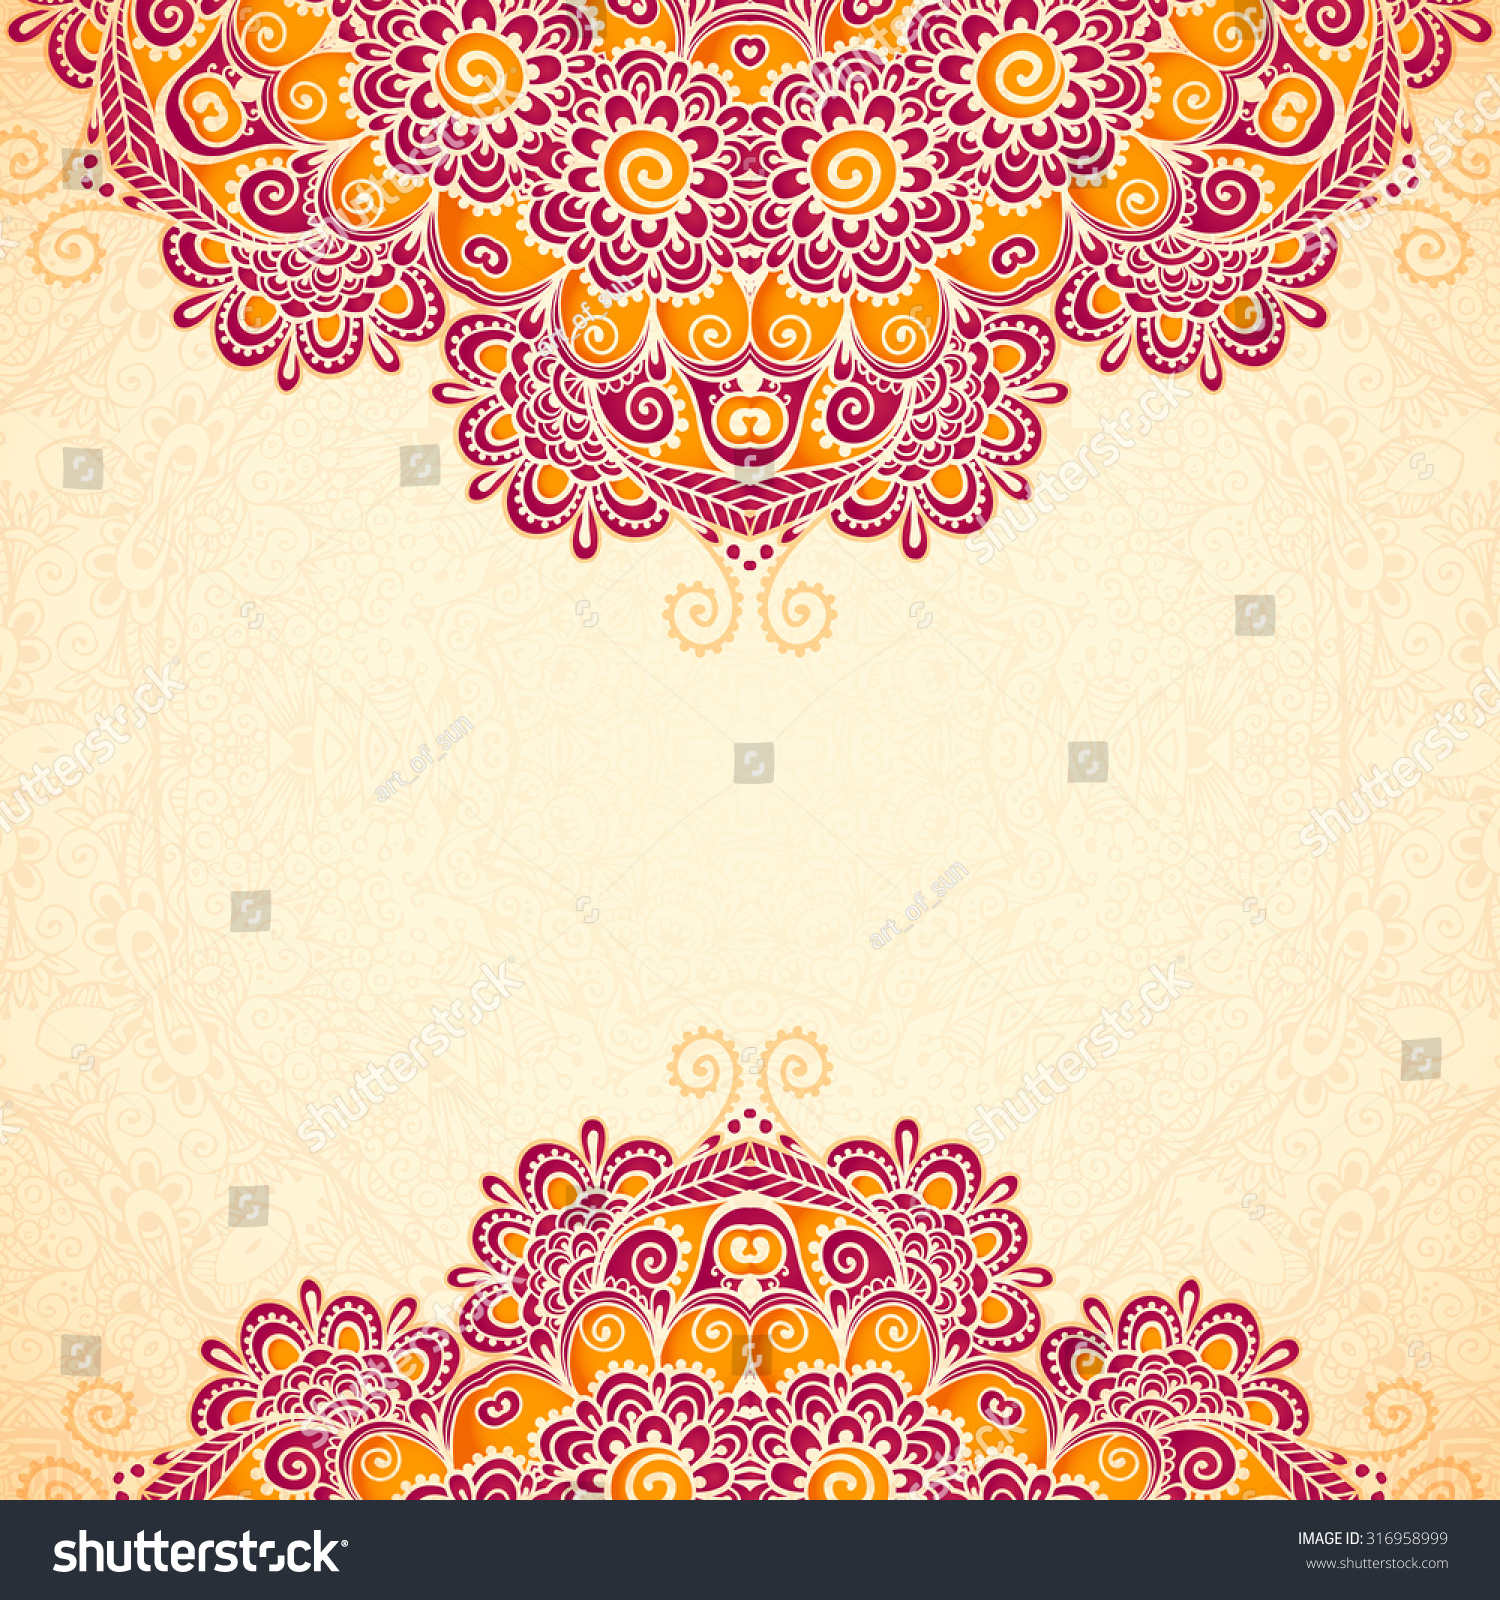 Ornate vintage vector background in mehndi style royalty free stock - Vector Vintage Flowers Ethnic Background In Indian Mehndi Style